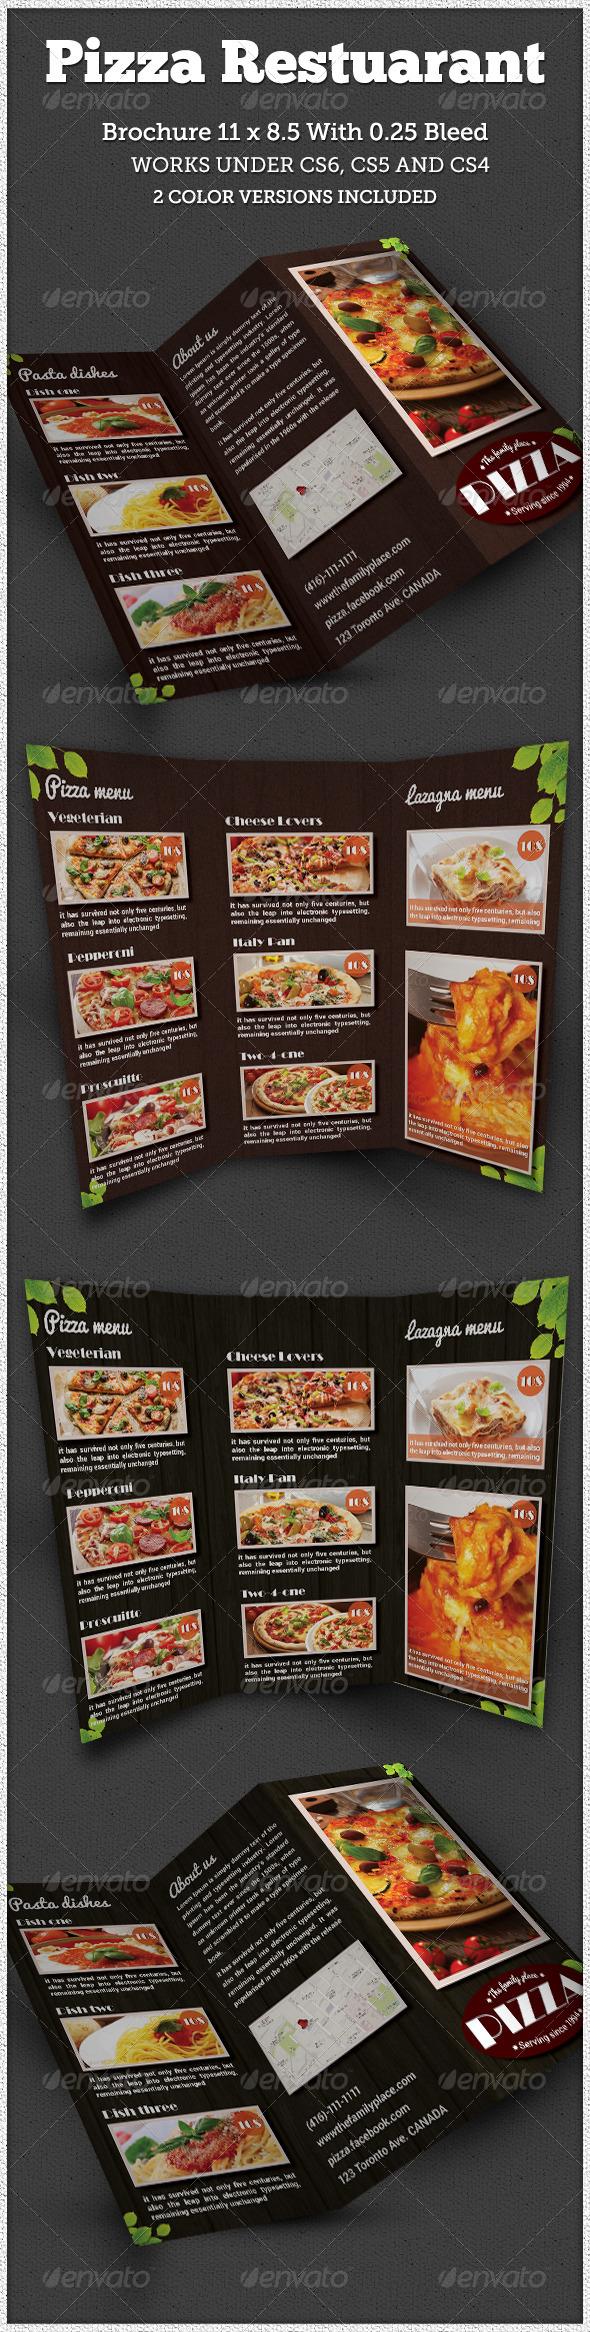 GraphicRiver Pizza Restaurant Tri-fold Brochure Indesign 6662968